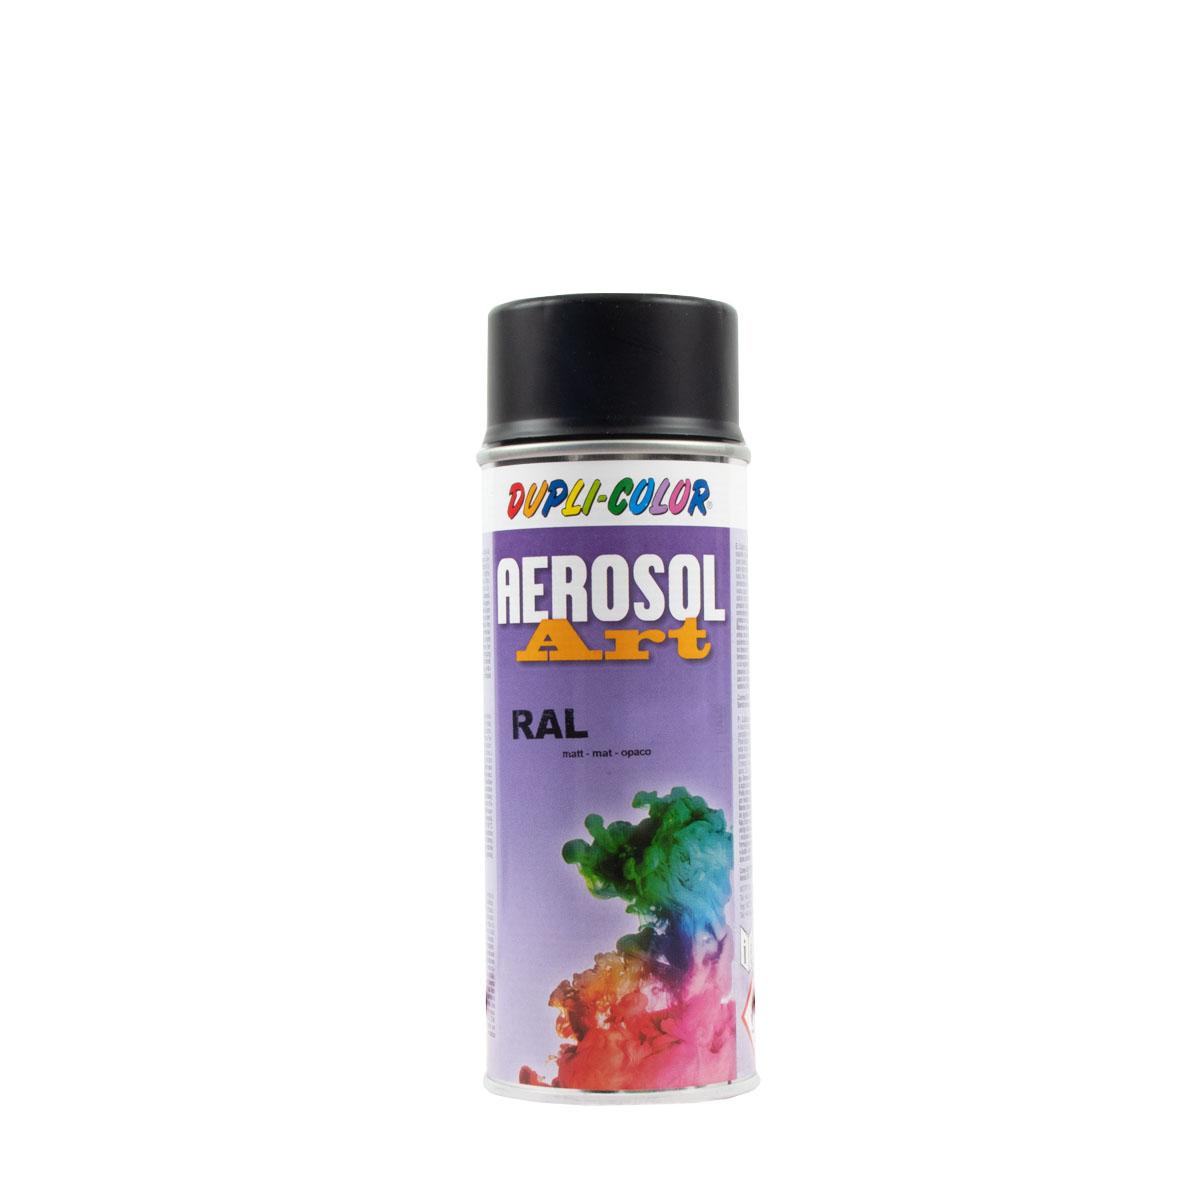 Dupli-Color Aerosol-Art matt 400ml RAL 9005 tiefschwarz, Sprühlack